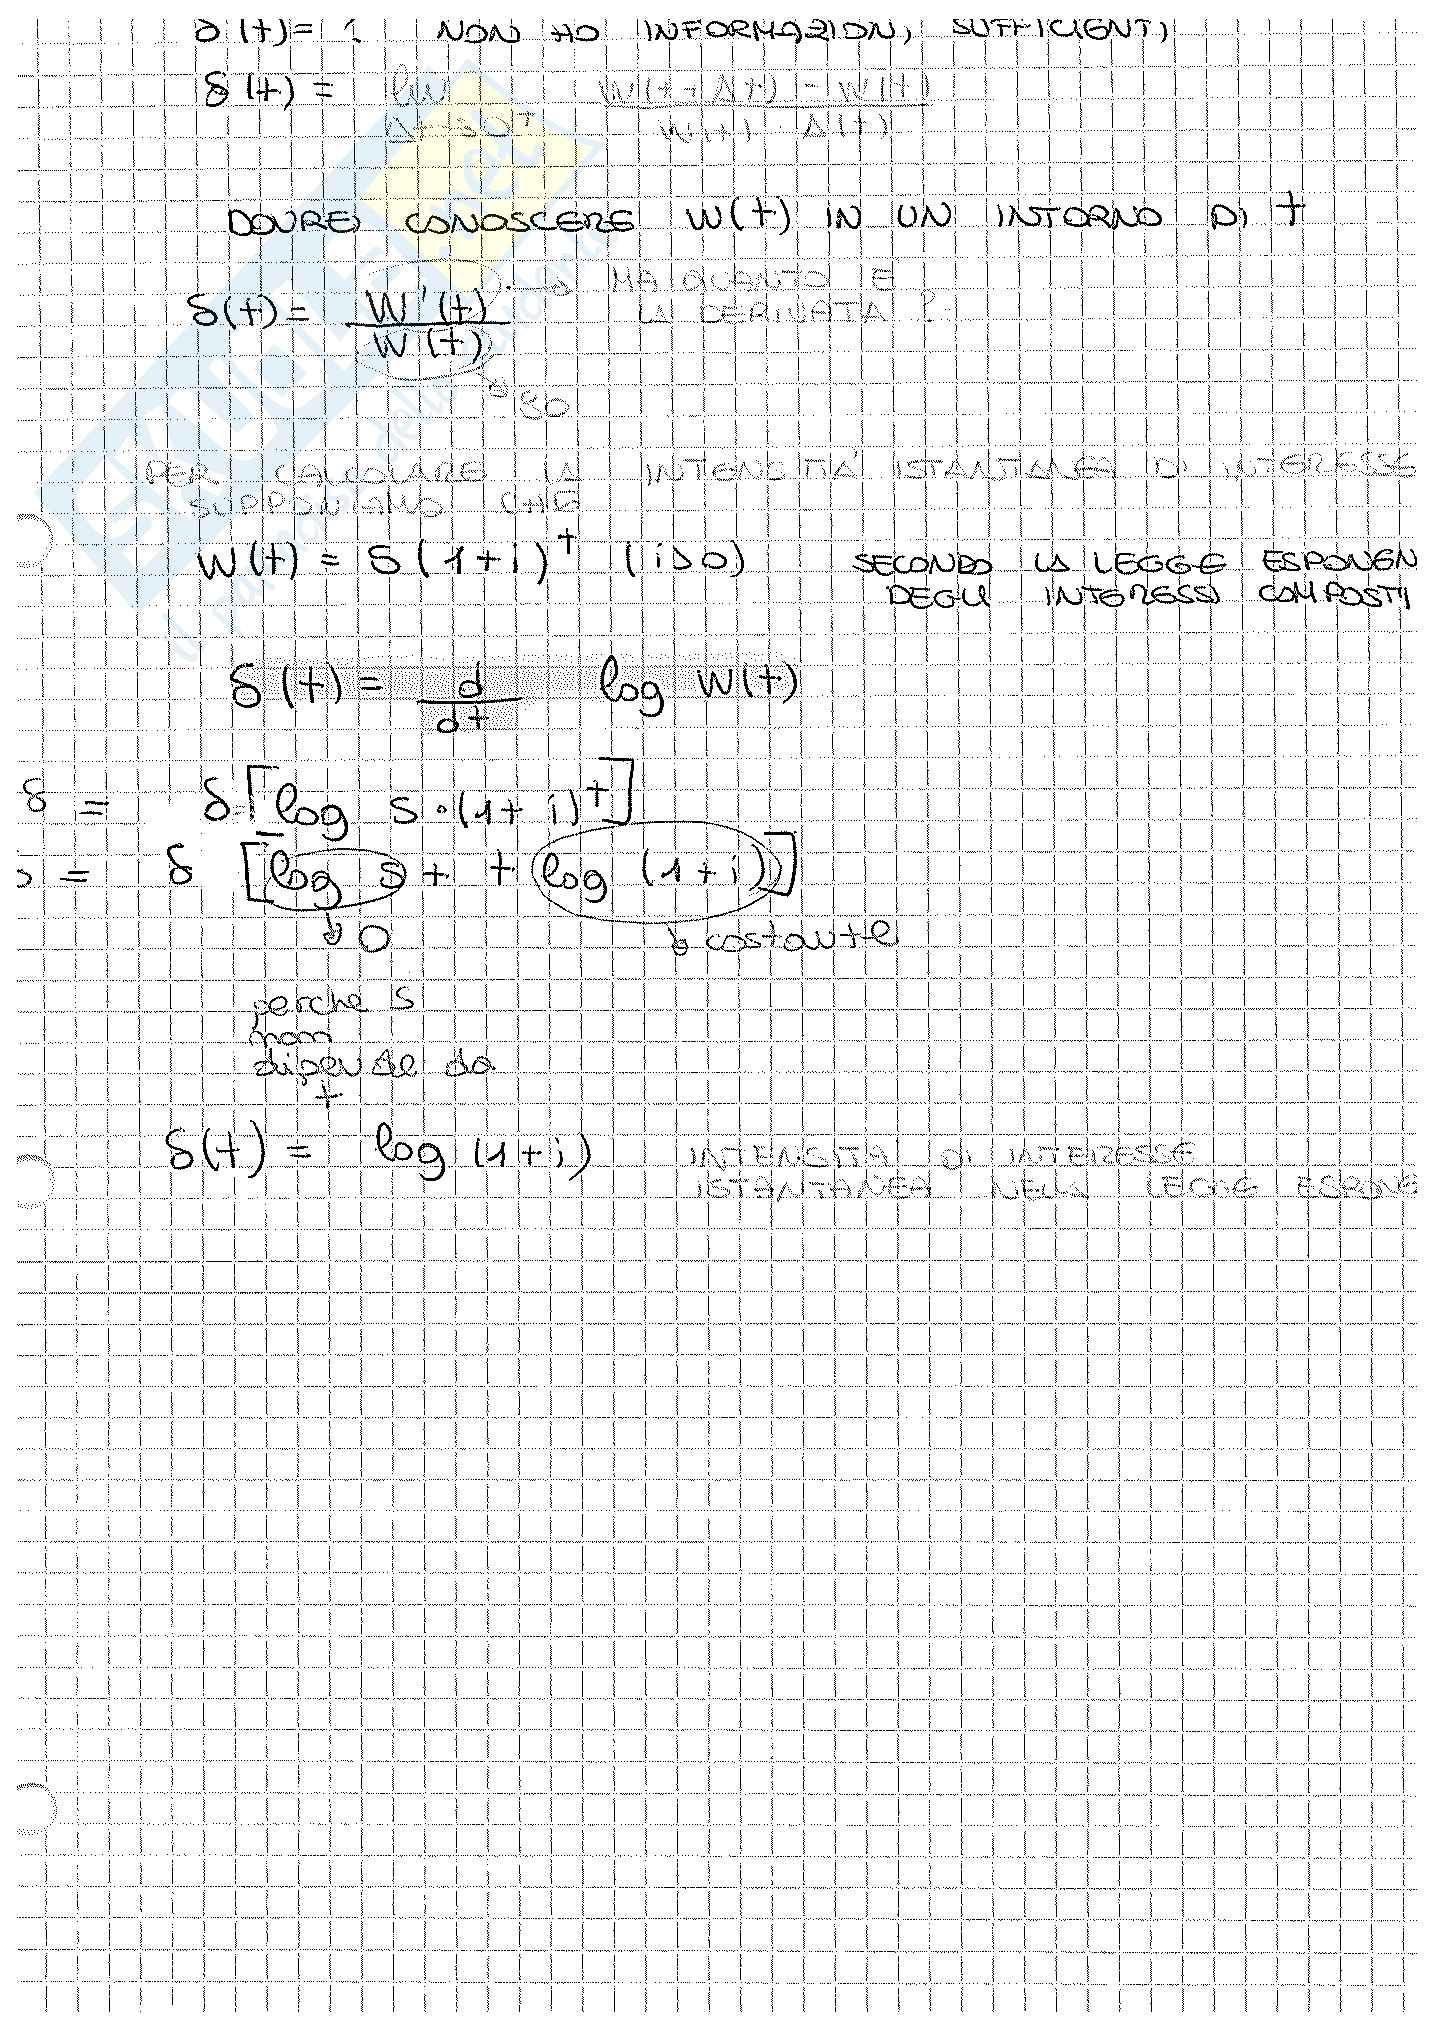 Appunti di Matematica Finanziaria, docente Claudio Pacati Pag. 11